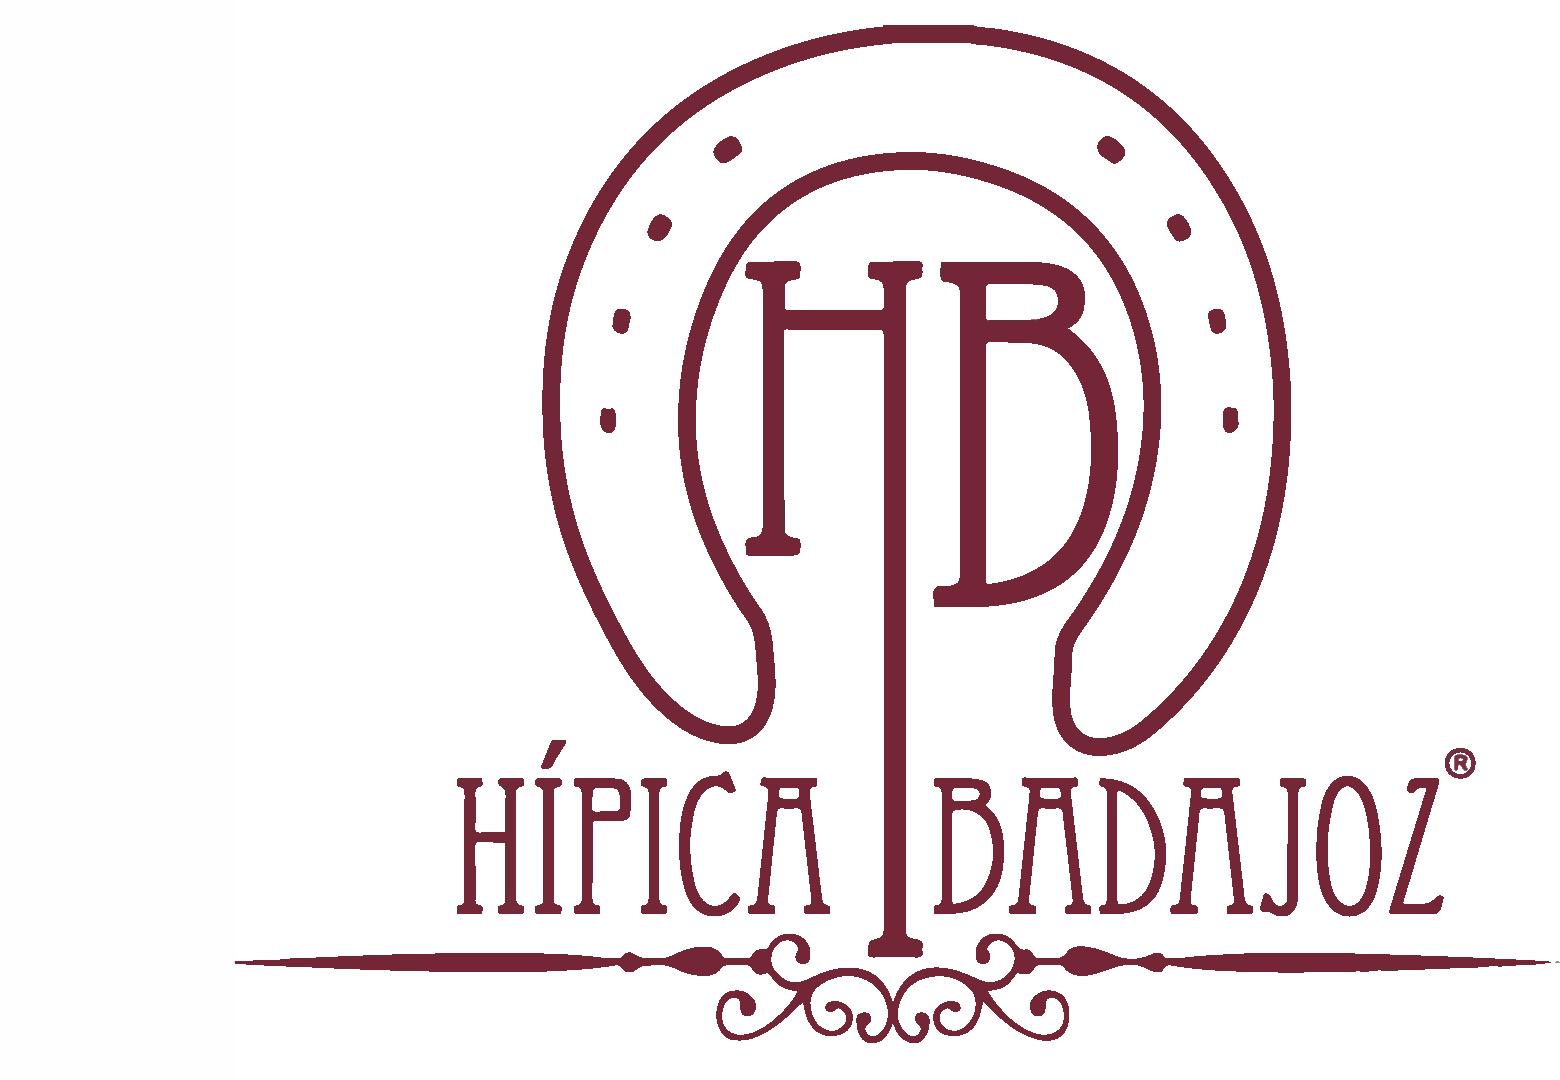 Hípica Badajoz